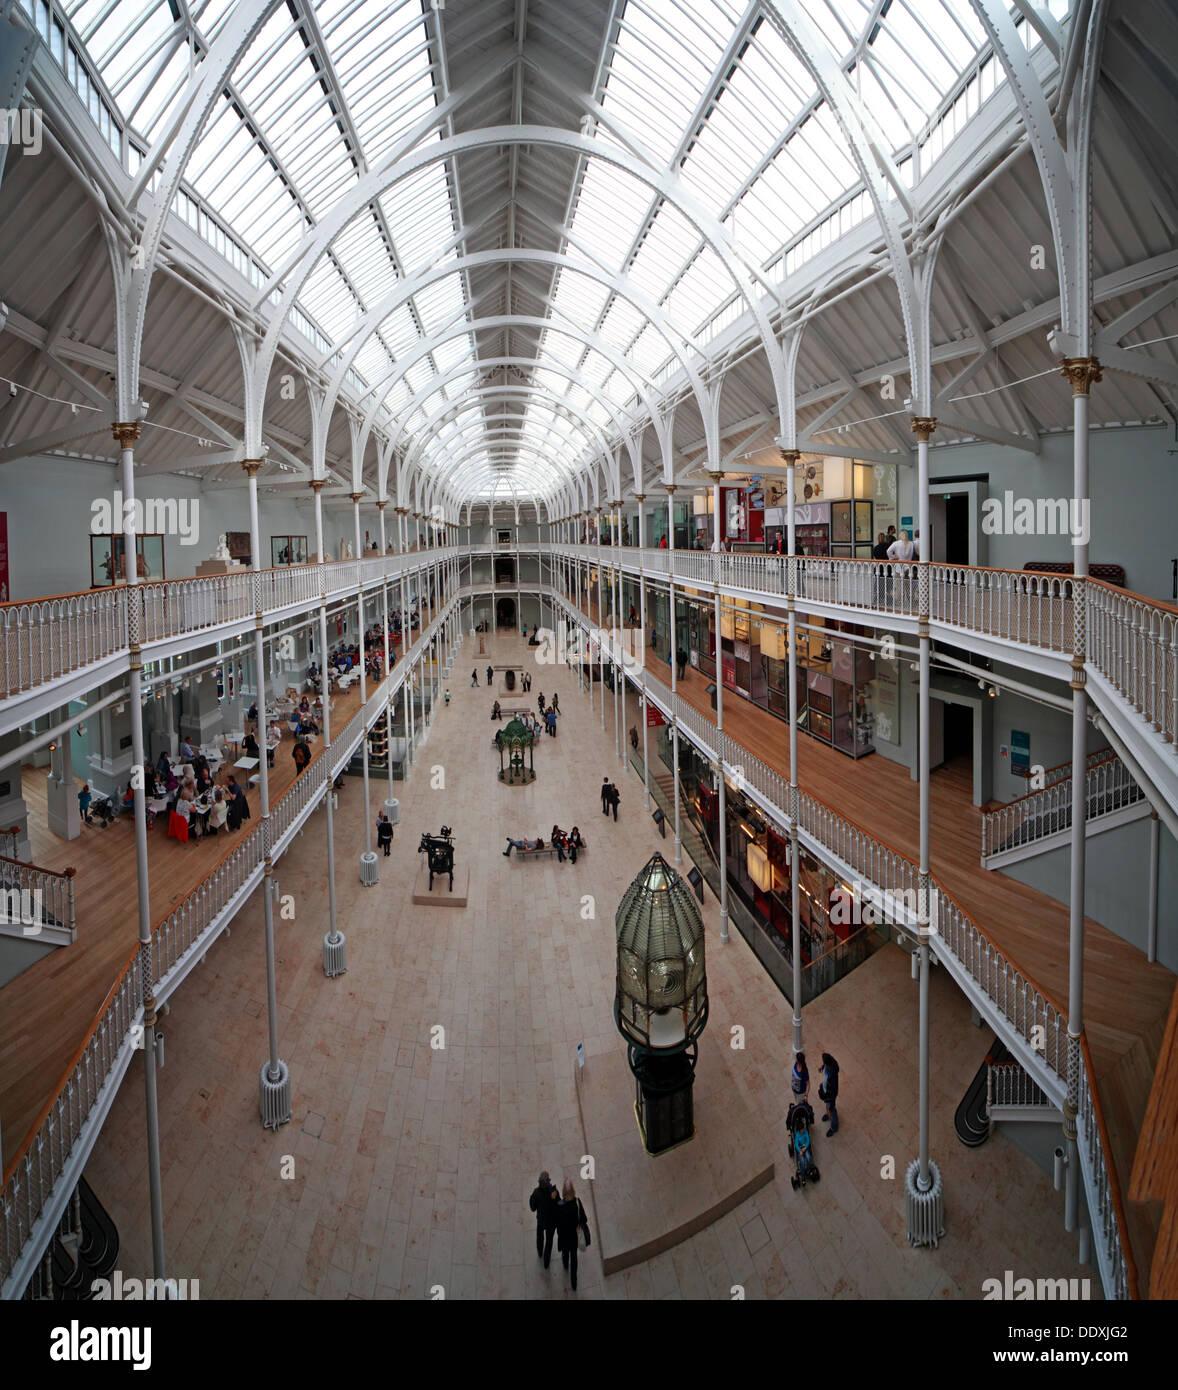 Laden Sie dieses Alamy Stockfoto National Museum of Scotland Interieur, Kammern St Edinburgh Stadt, Scotland UK EH1 1JF - DDXJG2